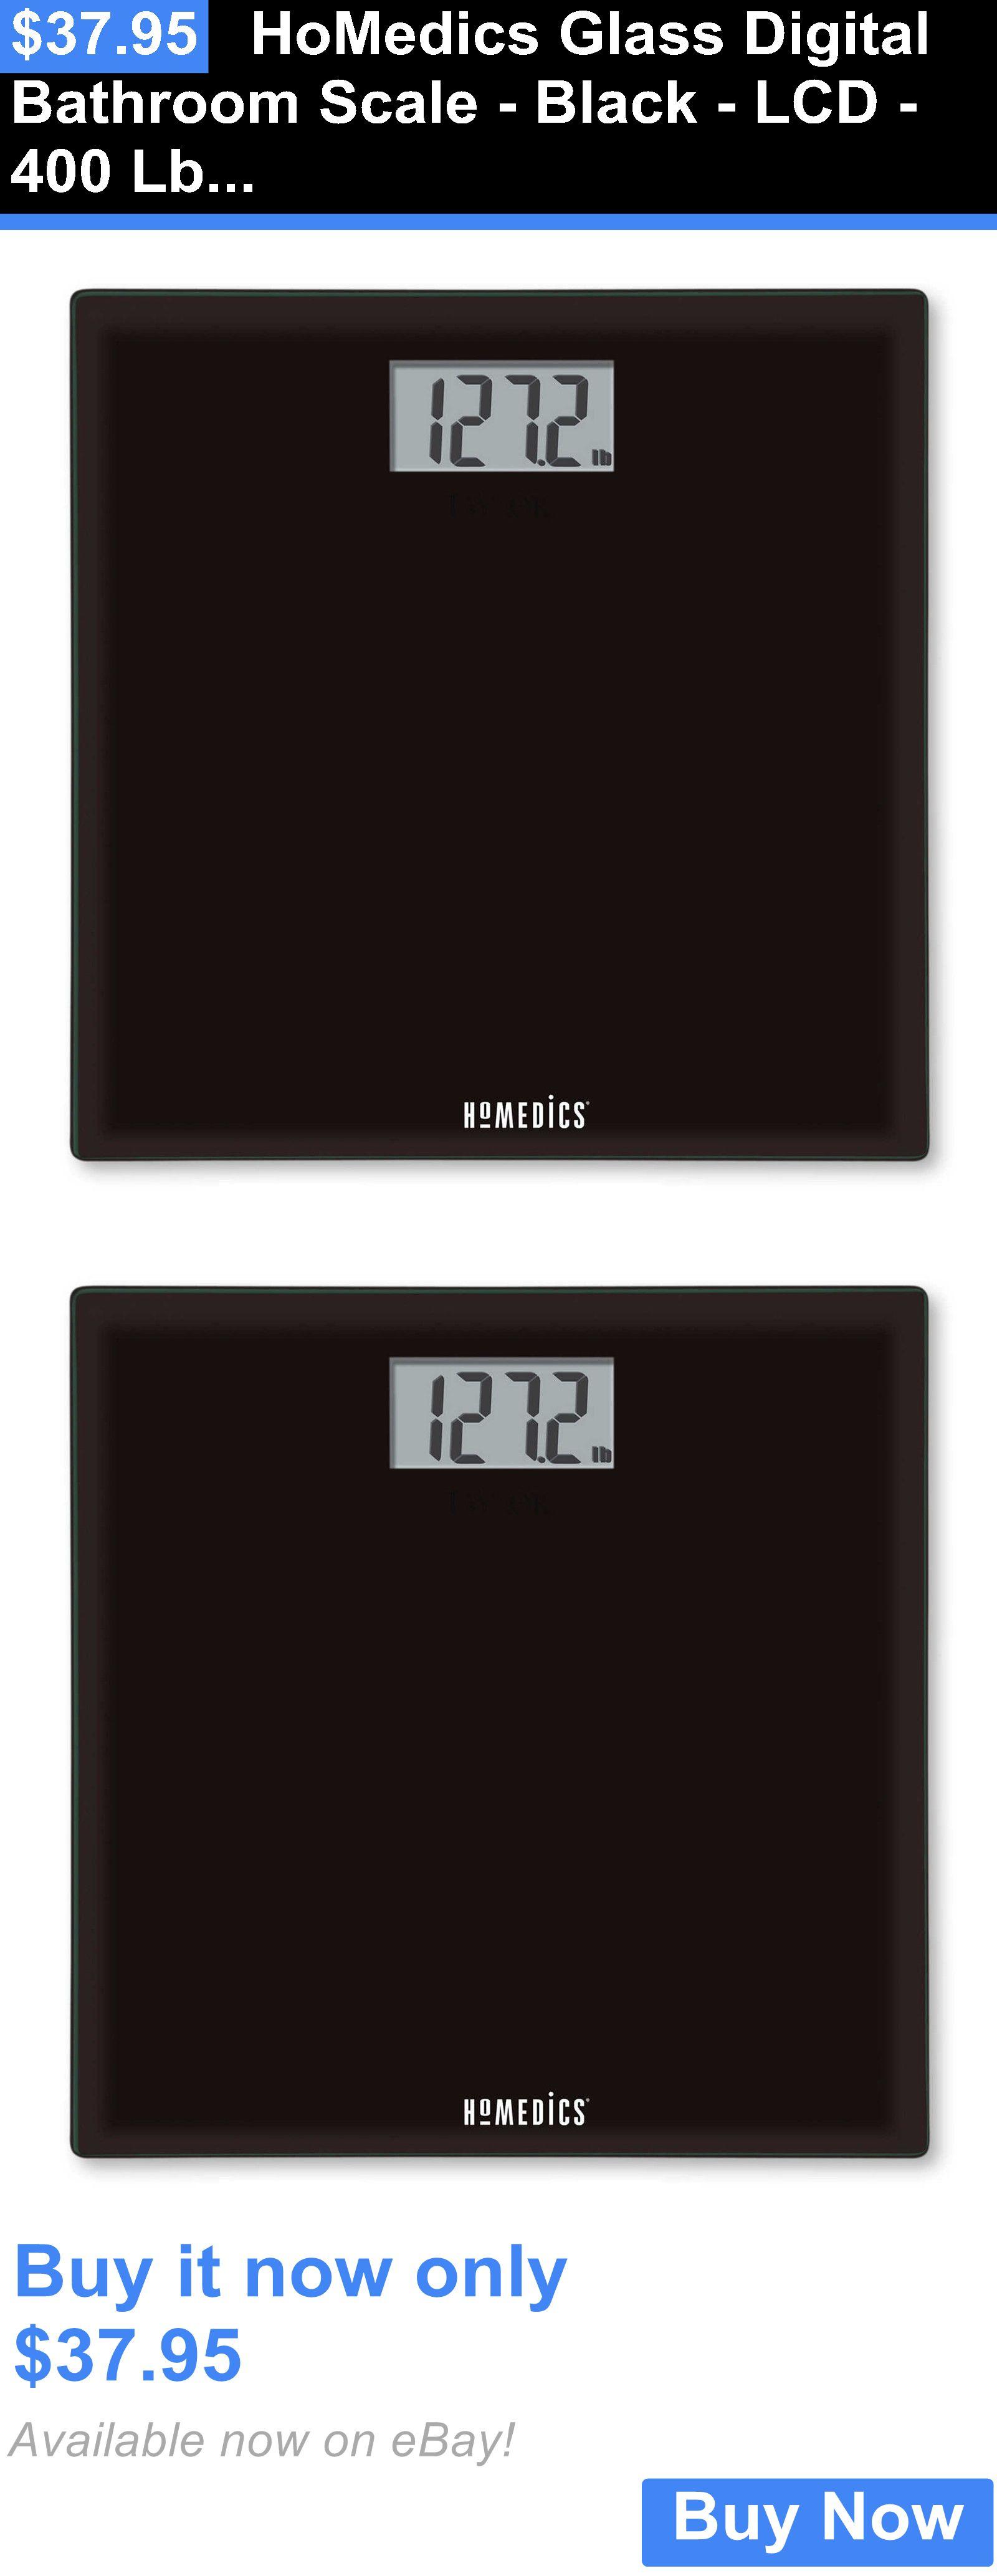 Black Bathroom Scales Scales Homedics Glass Digital Bathroom Scale Black Lcd 400